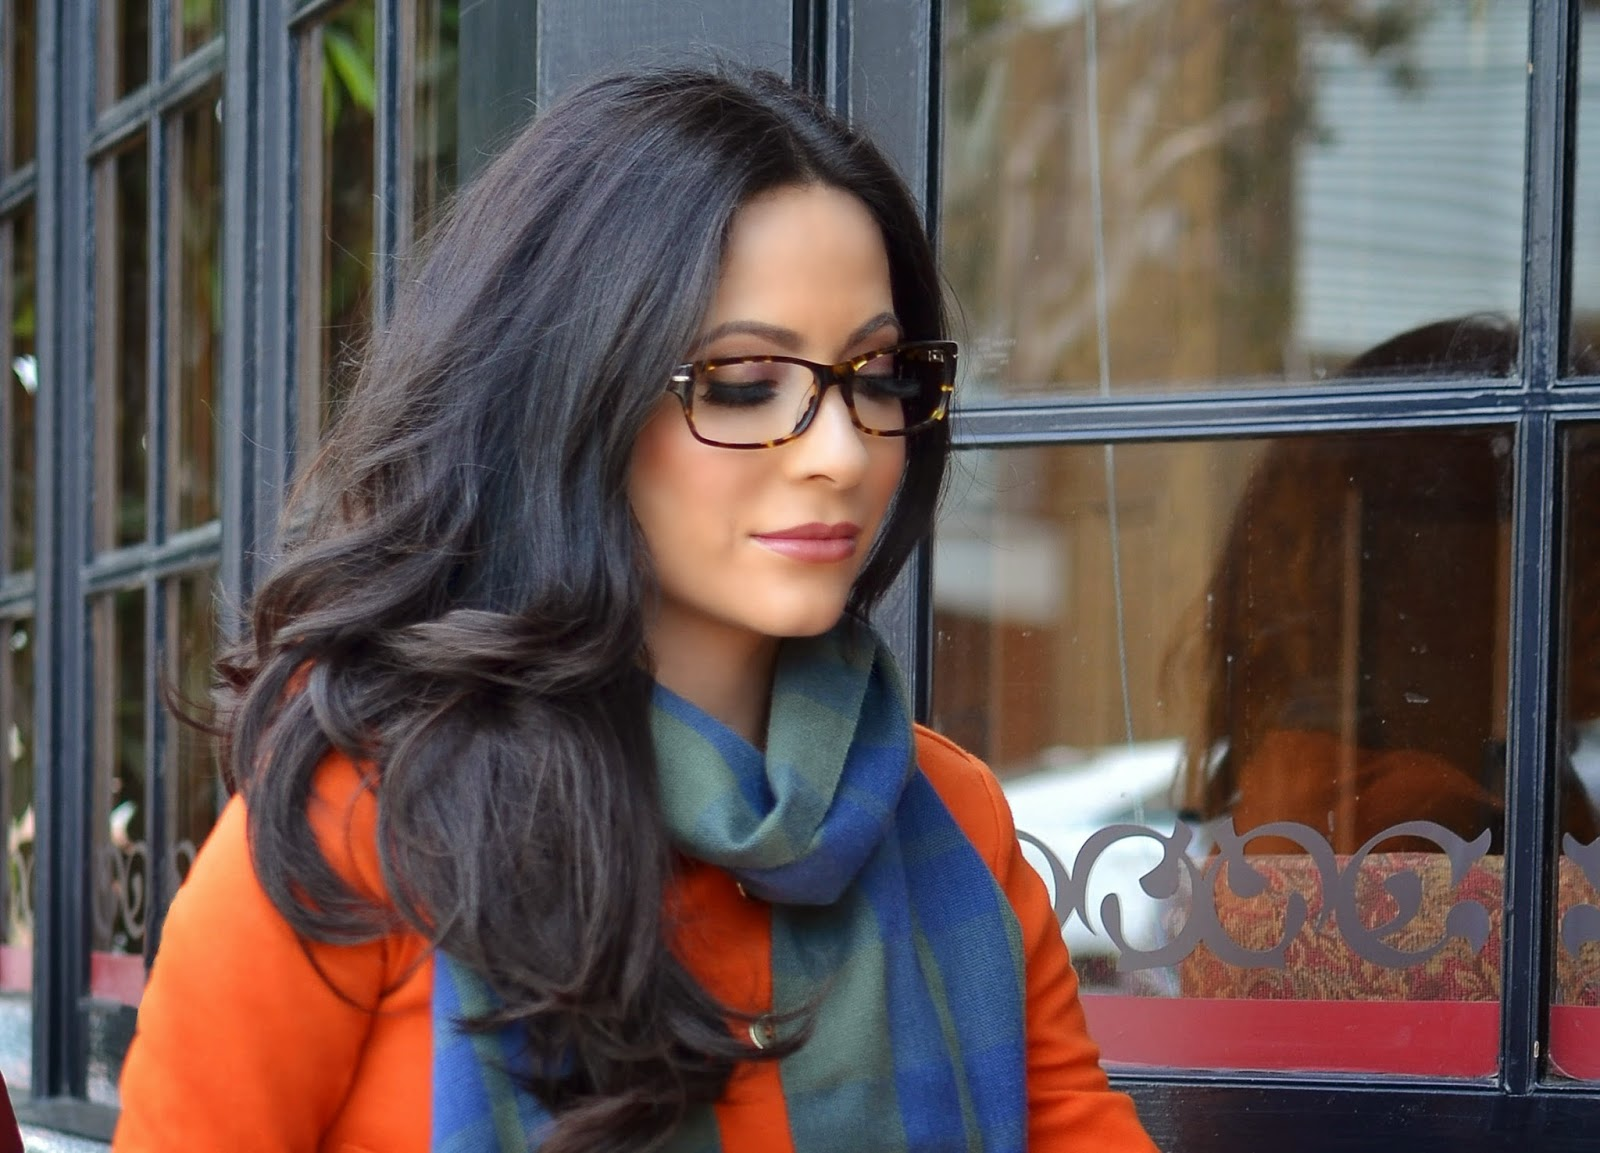 online optical c6di  Firmoo Eyewear Firmoocom Global Online Optical Store Orange H&M Jacket  Armani Exchage Navy Blue